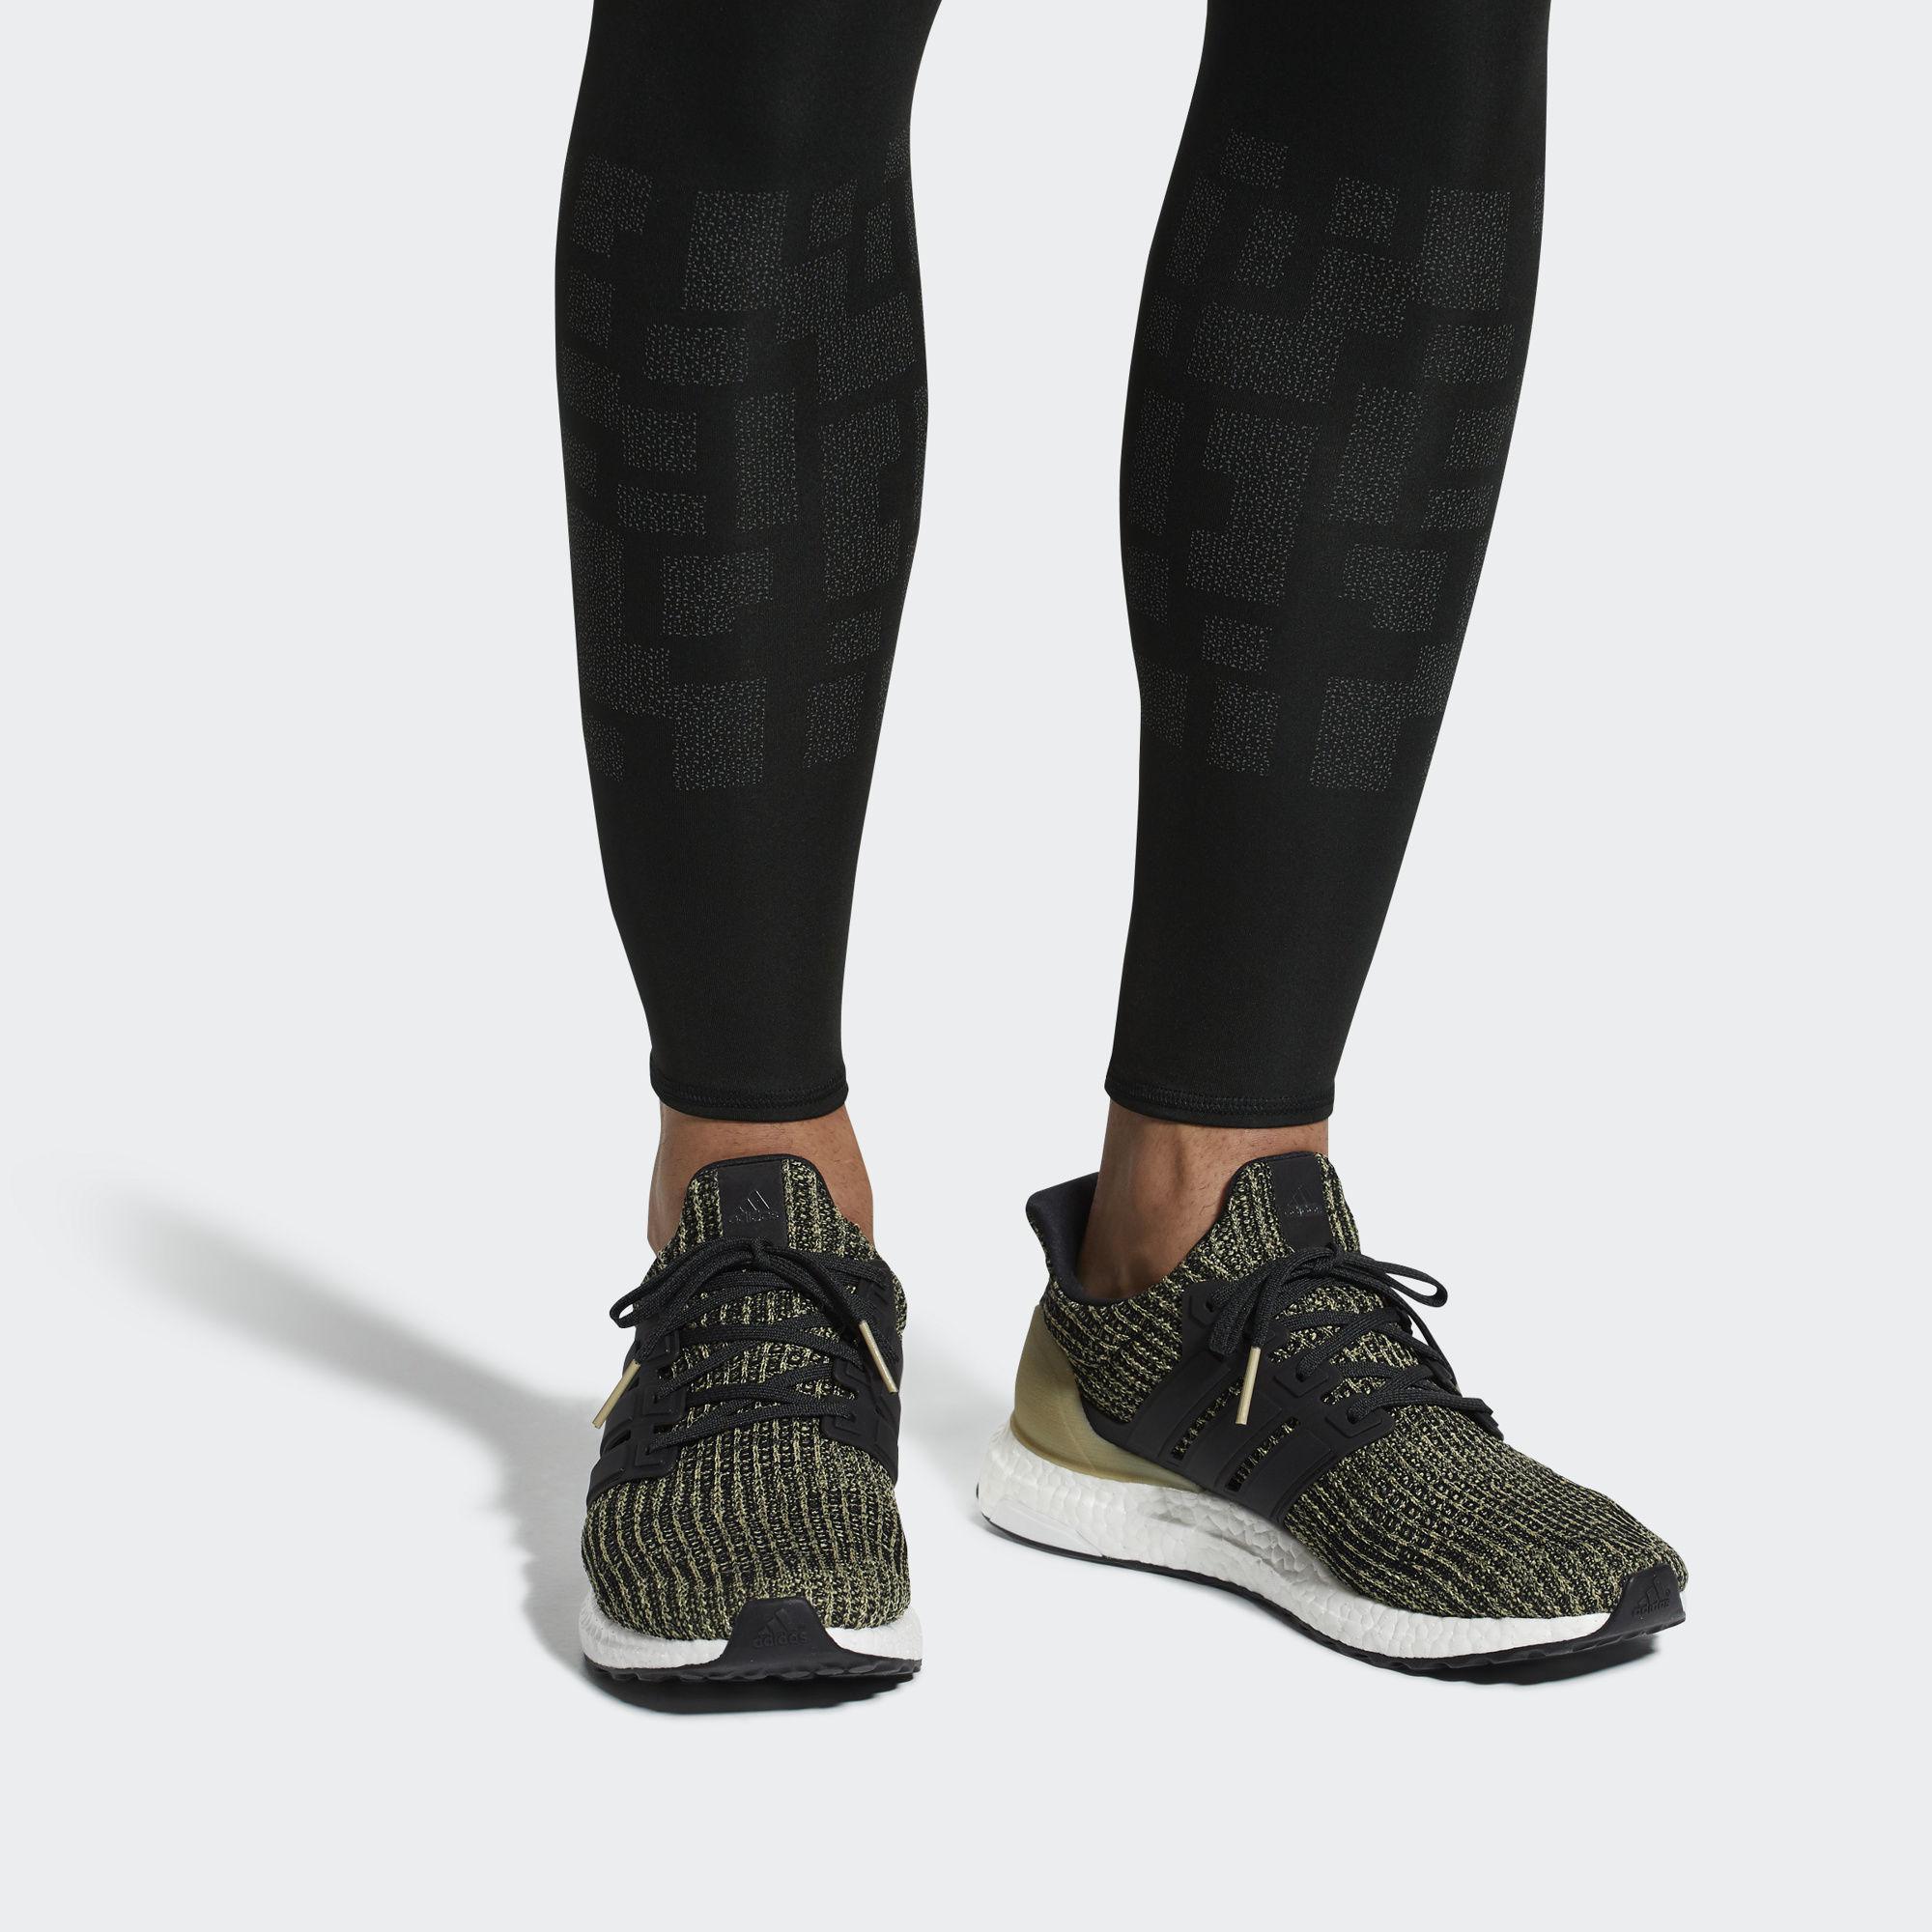 690205c73f461 Adidas Mens Ultra Boost Running Shoes - Dark Mocha - Tennisnuts.com